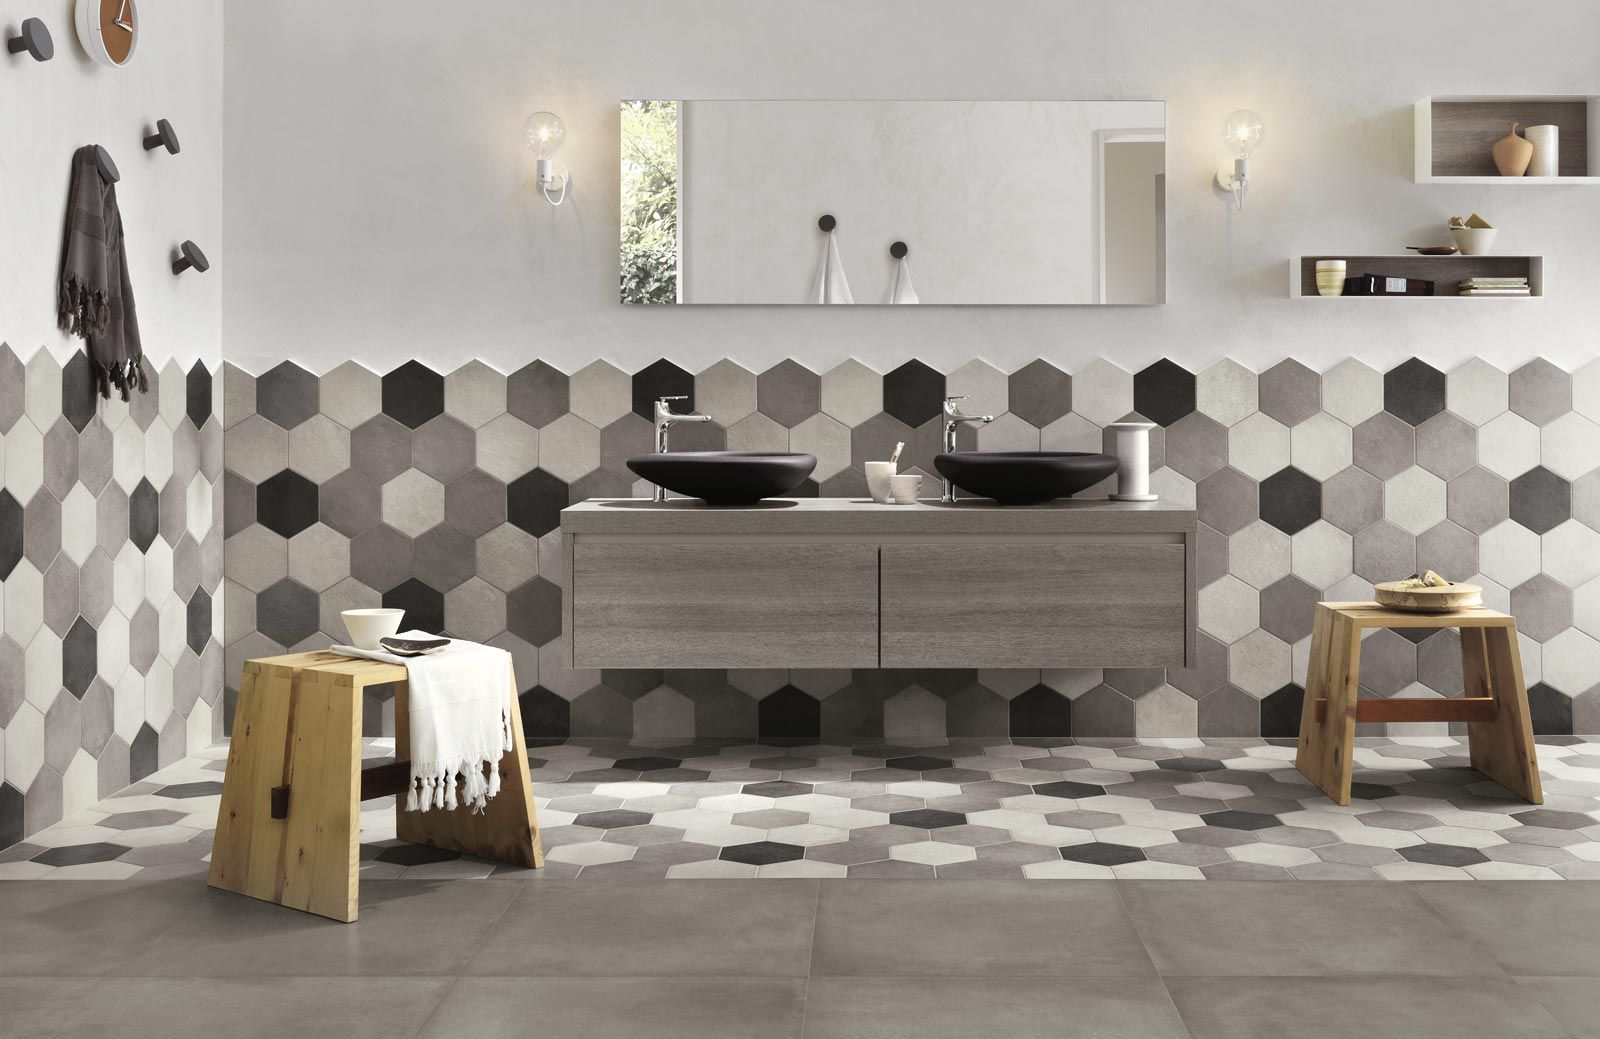 Ragno: Piastrelle Bagno_6108 | Home cool home | Pinterest ...